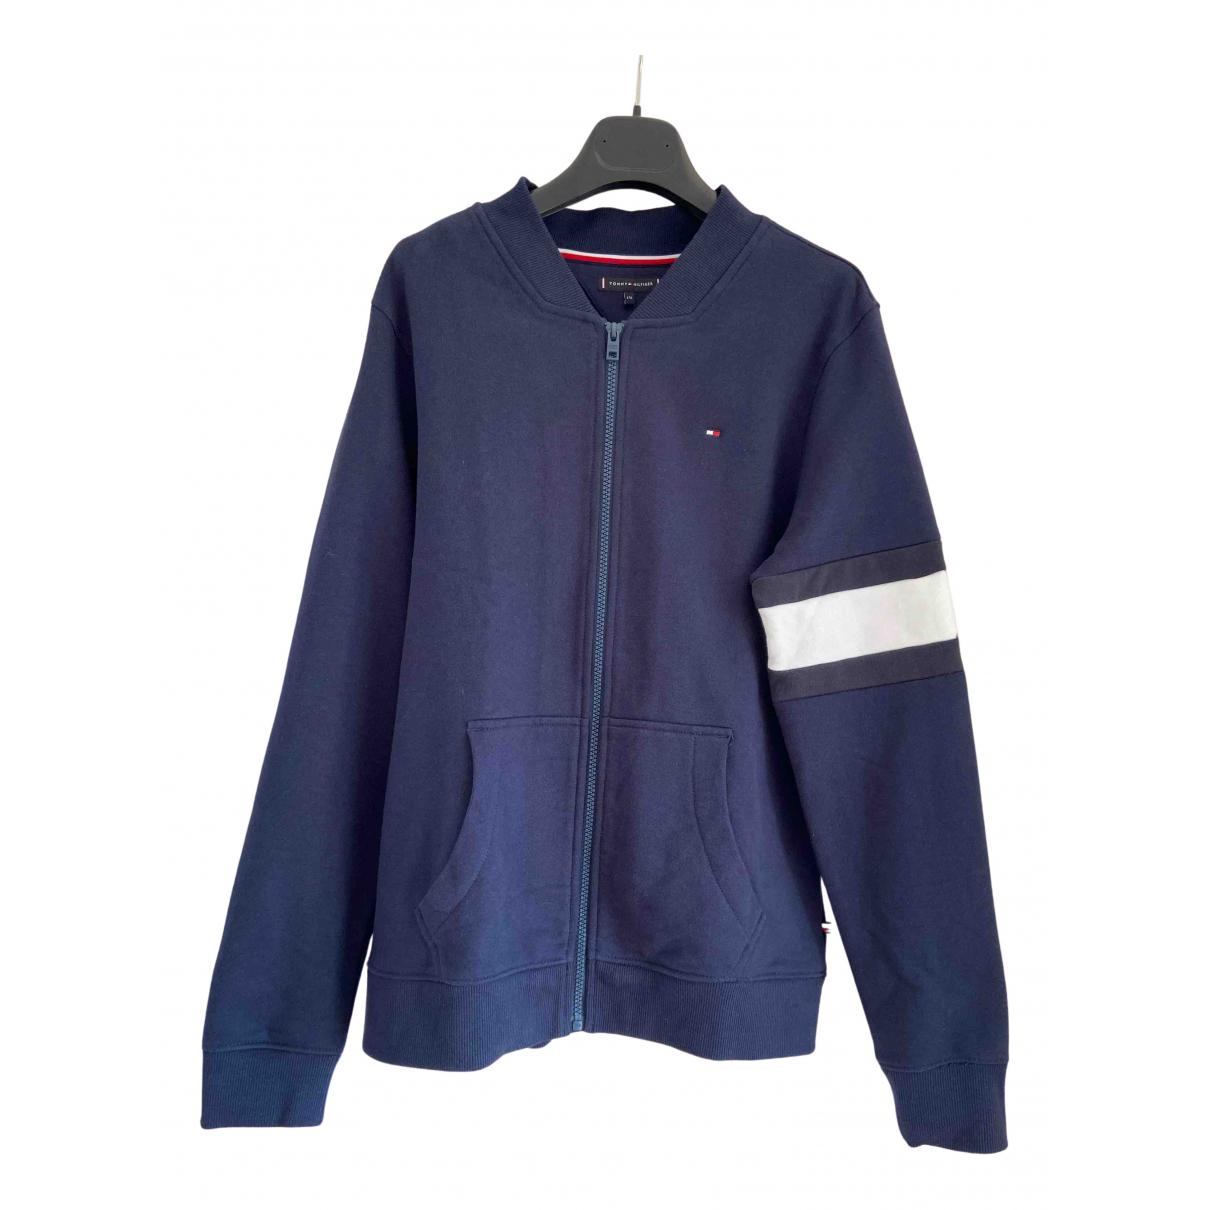 Tommy Hilfiger N Blue Cotton Knitwear & Sweatshirts for Men S International